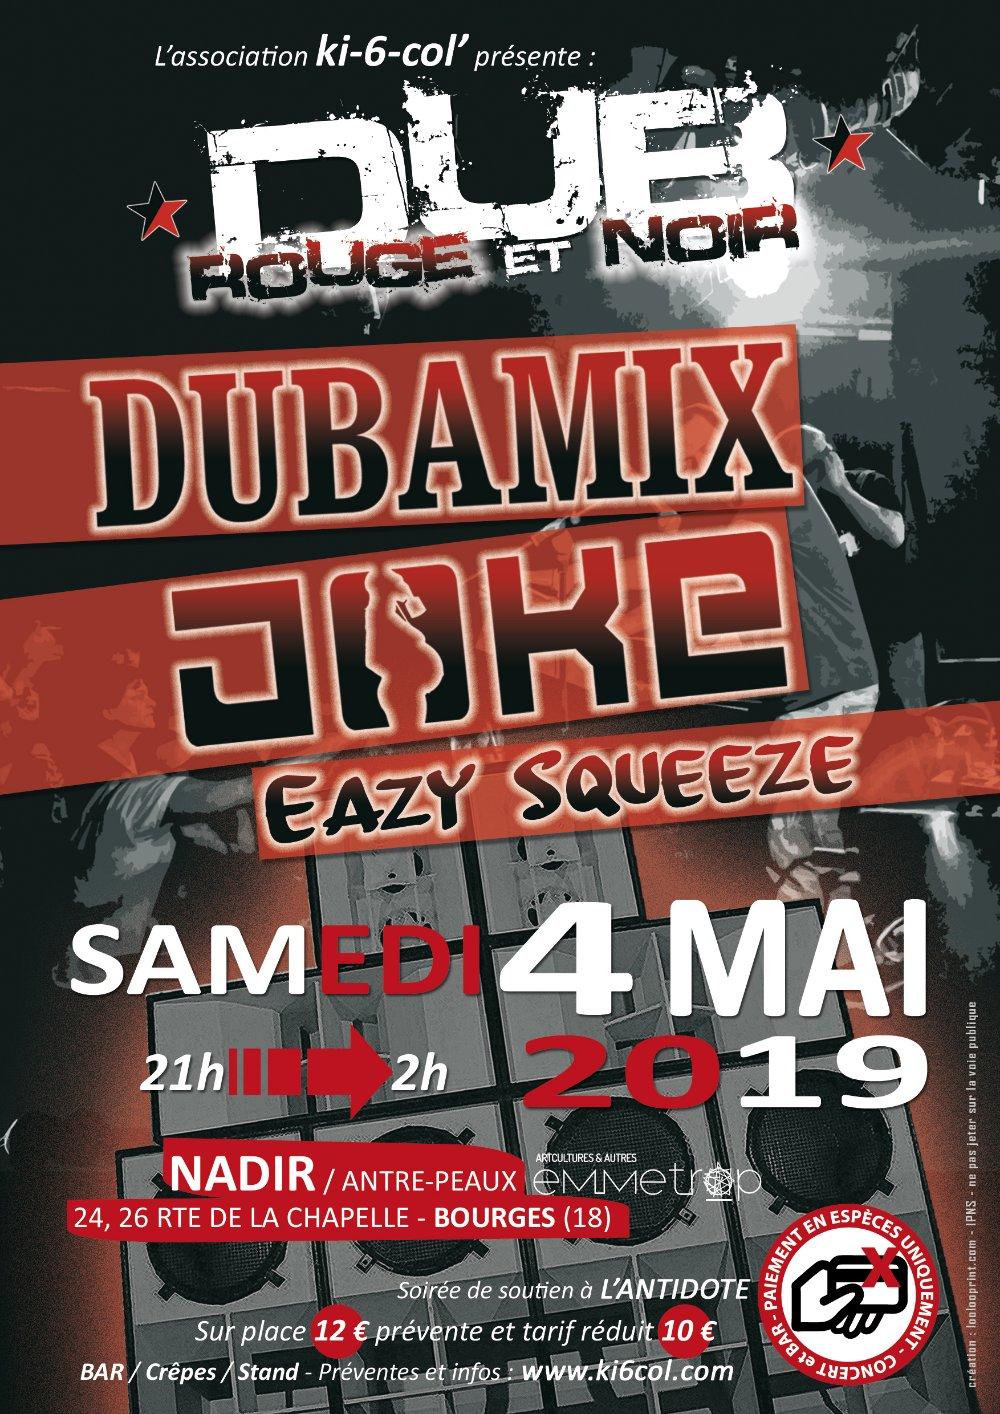 Dubamix x Joke + Easy Squezze